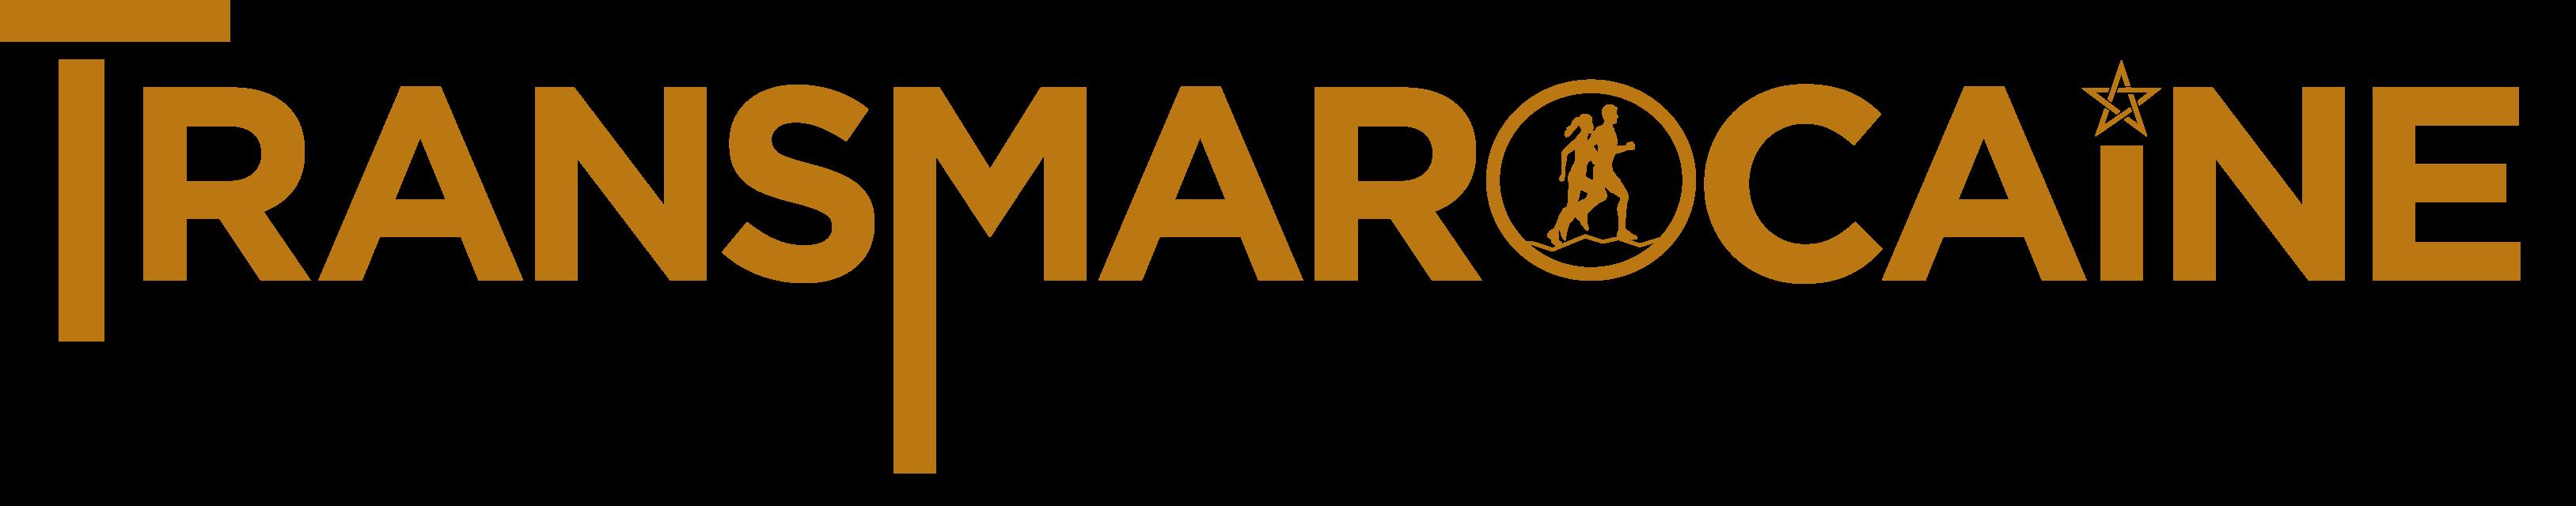 Logo-TransMarocaine-Tizi-N-Trail